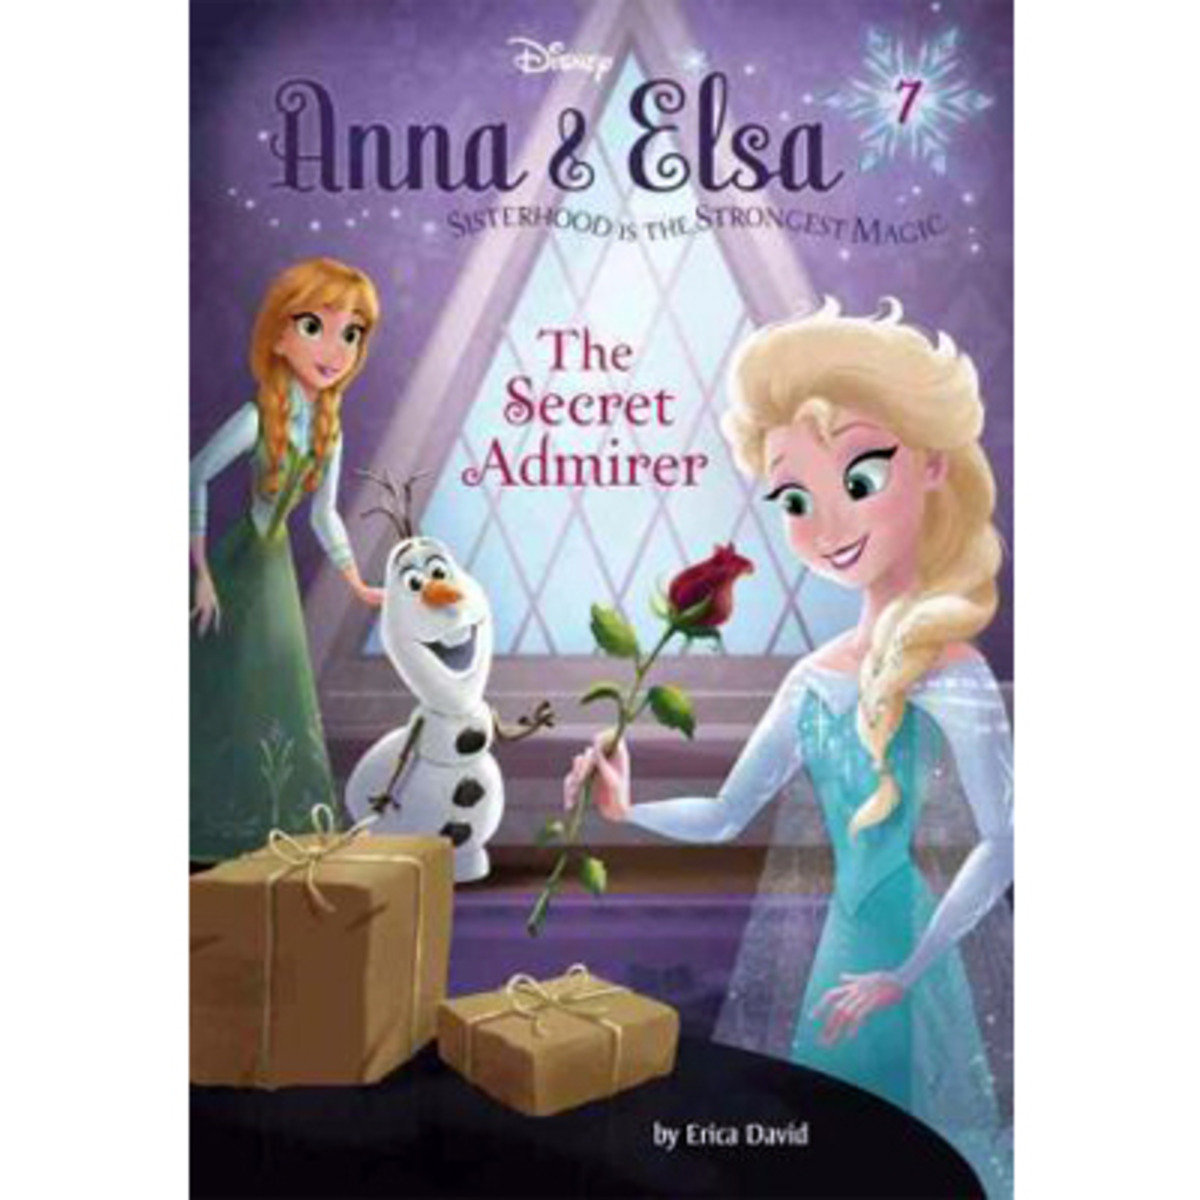 Anna & Elsa #7 The Secret Admirer